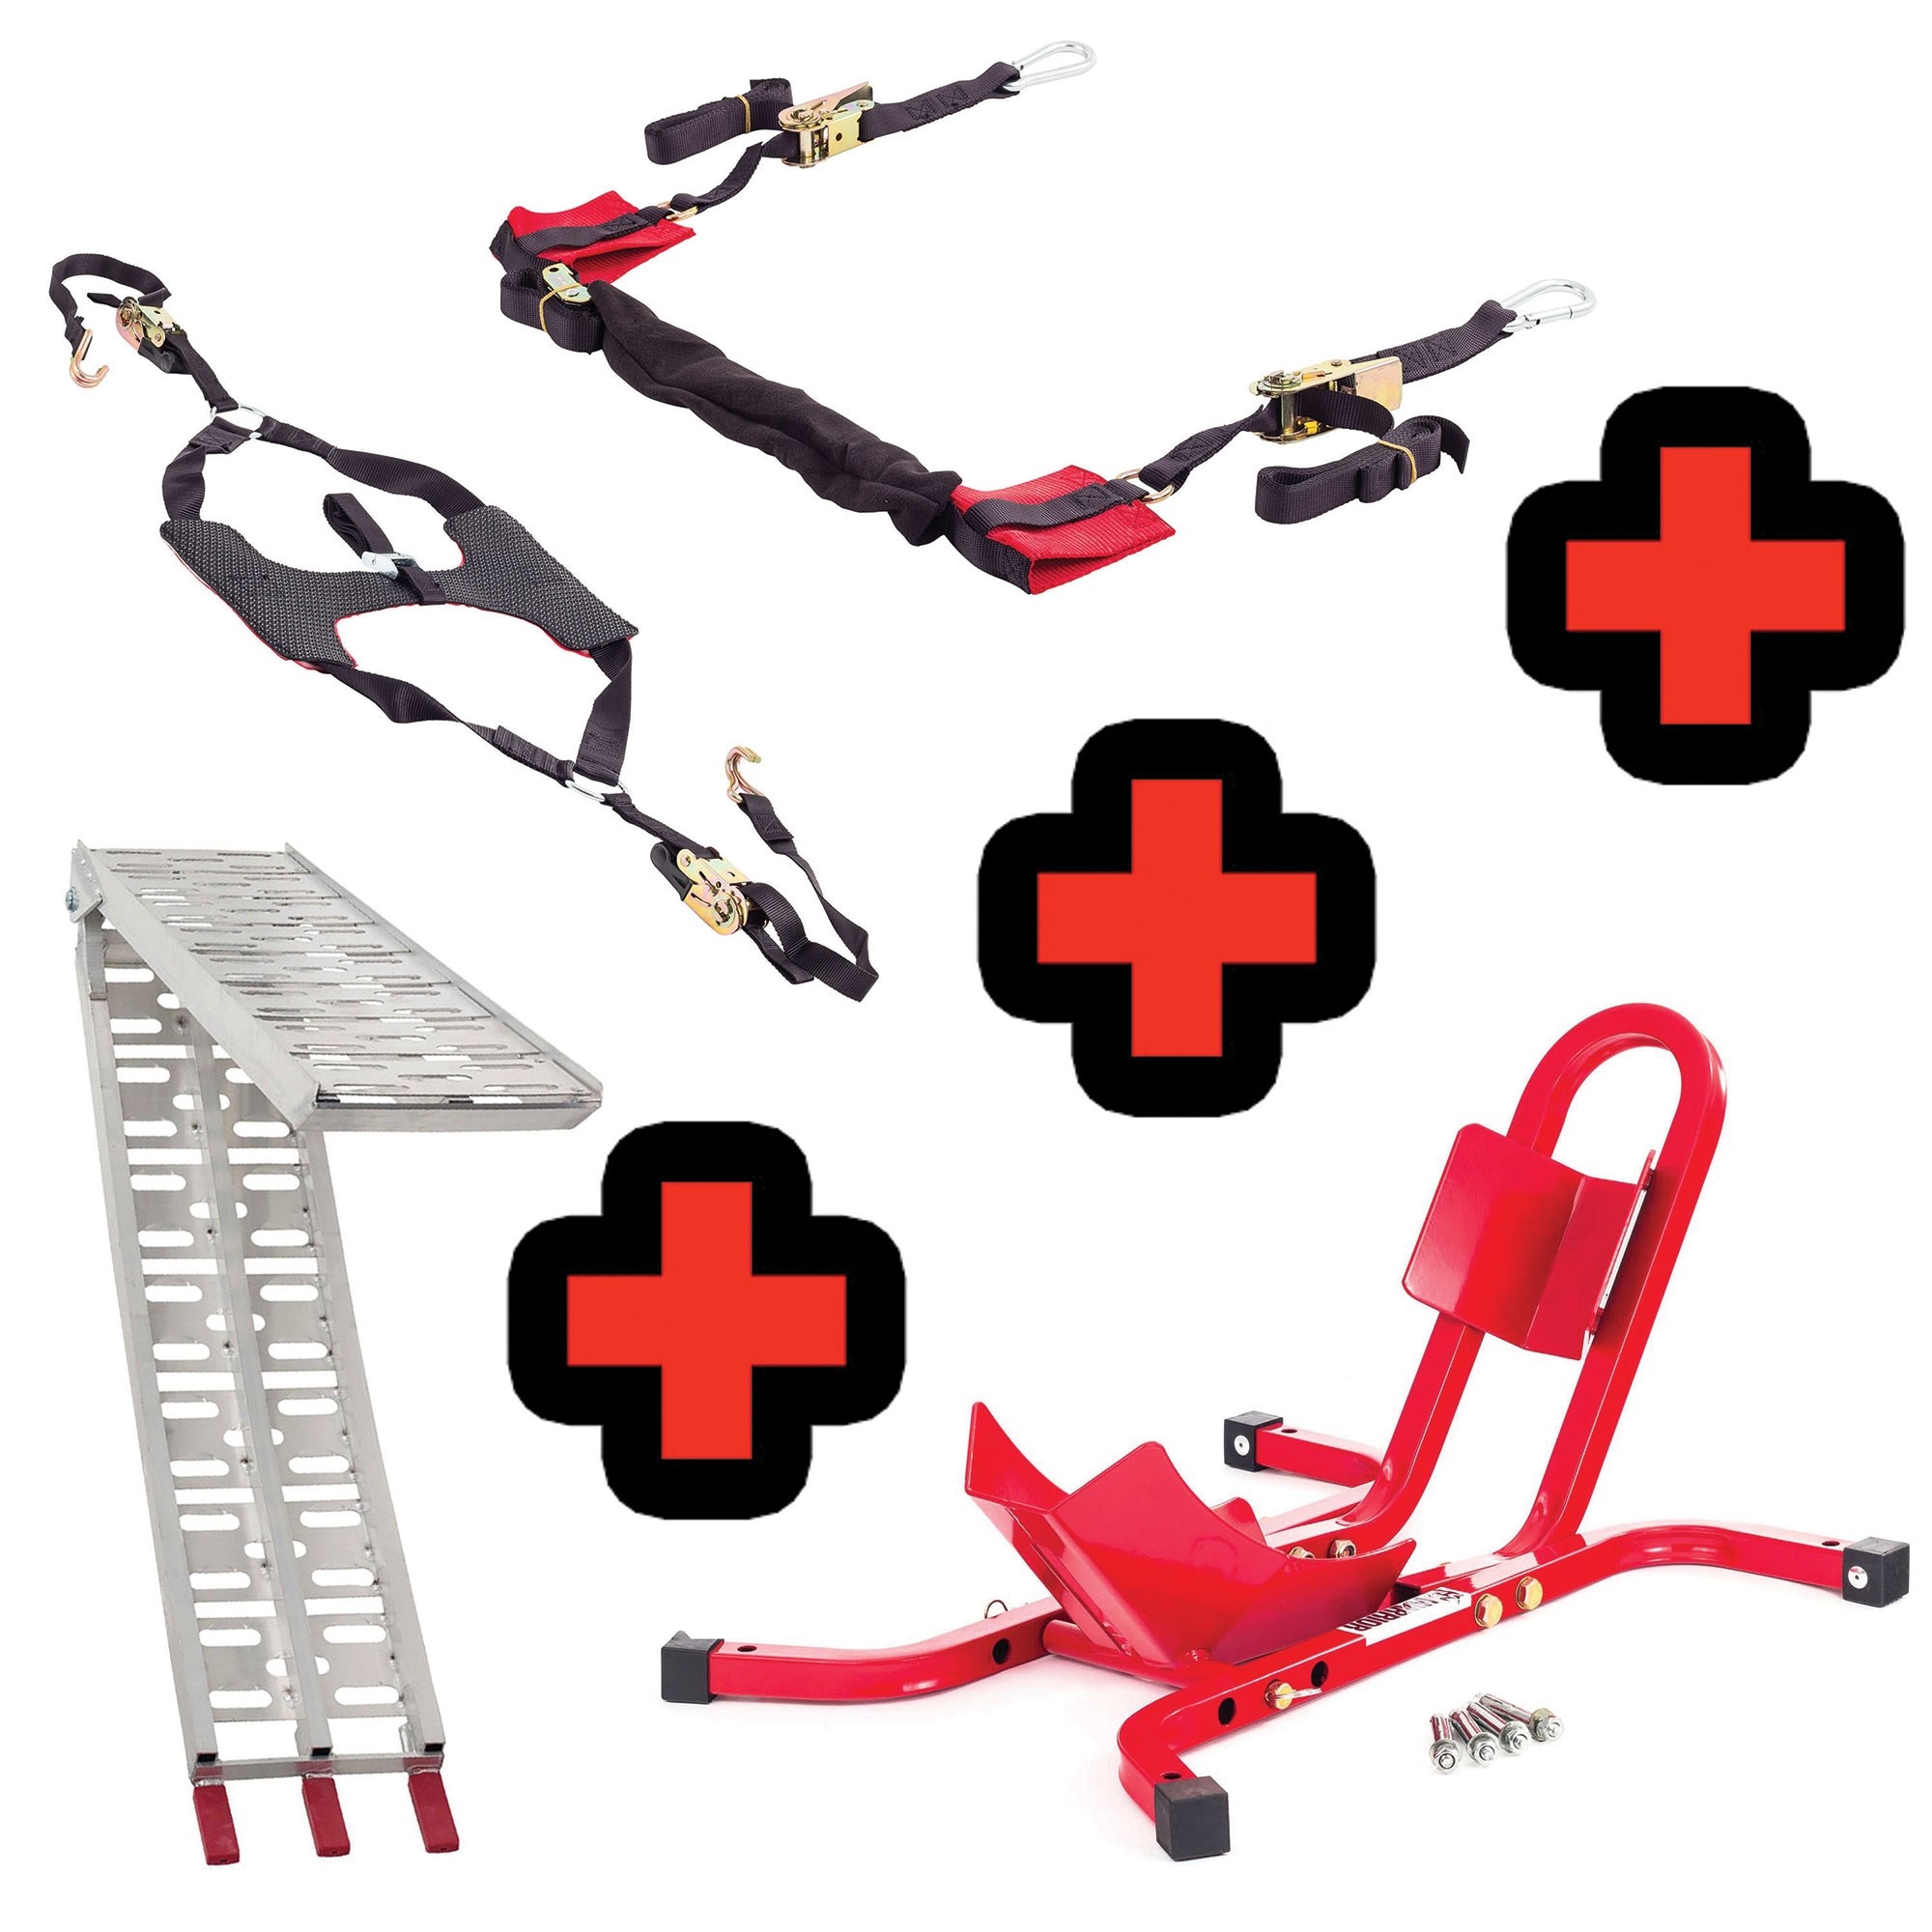 Ratchet Bar Strap Warrior 17-21 Inch Bike Wheel Chock Combo Tyre Down